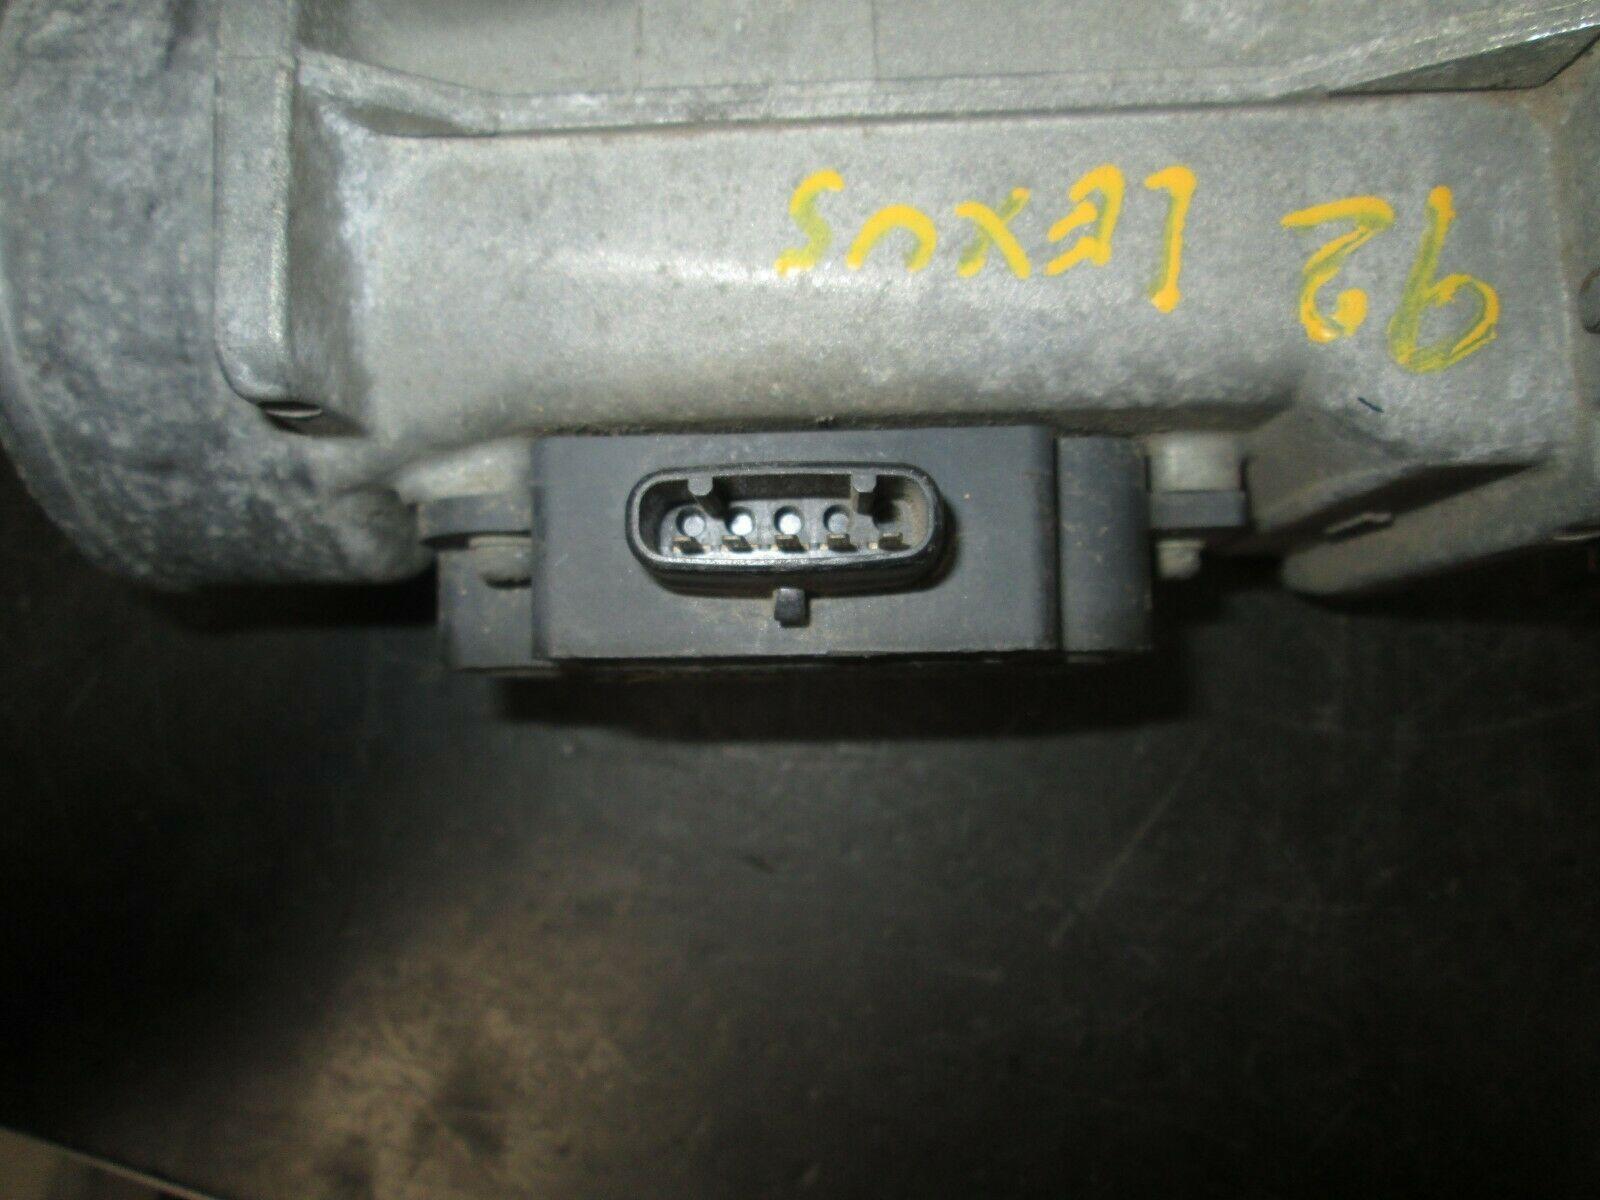 90-94 LEXUS LS400 GS400 GS300 SC300 AIR FLOW METER SENSOR 22204-42011(BOX-11460)